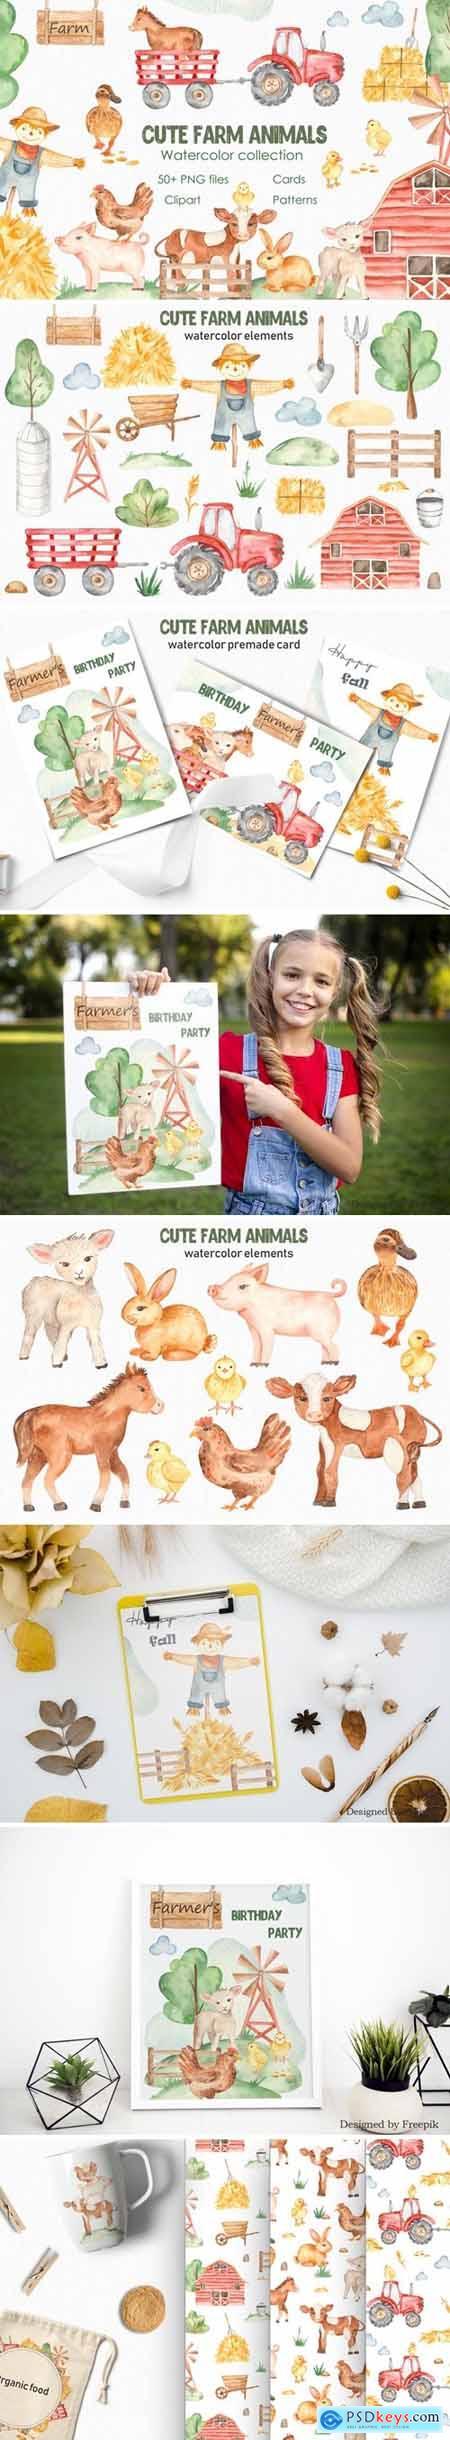 Watercolor cute farm animals Collection clipart